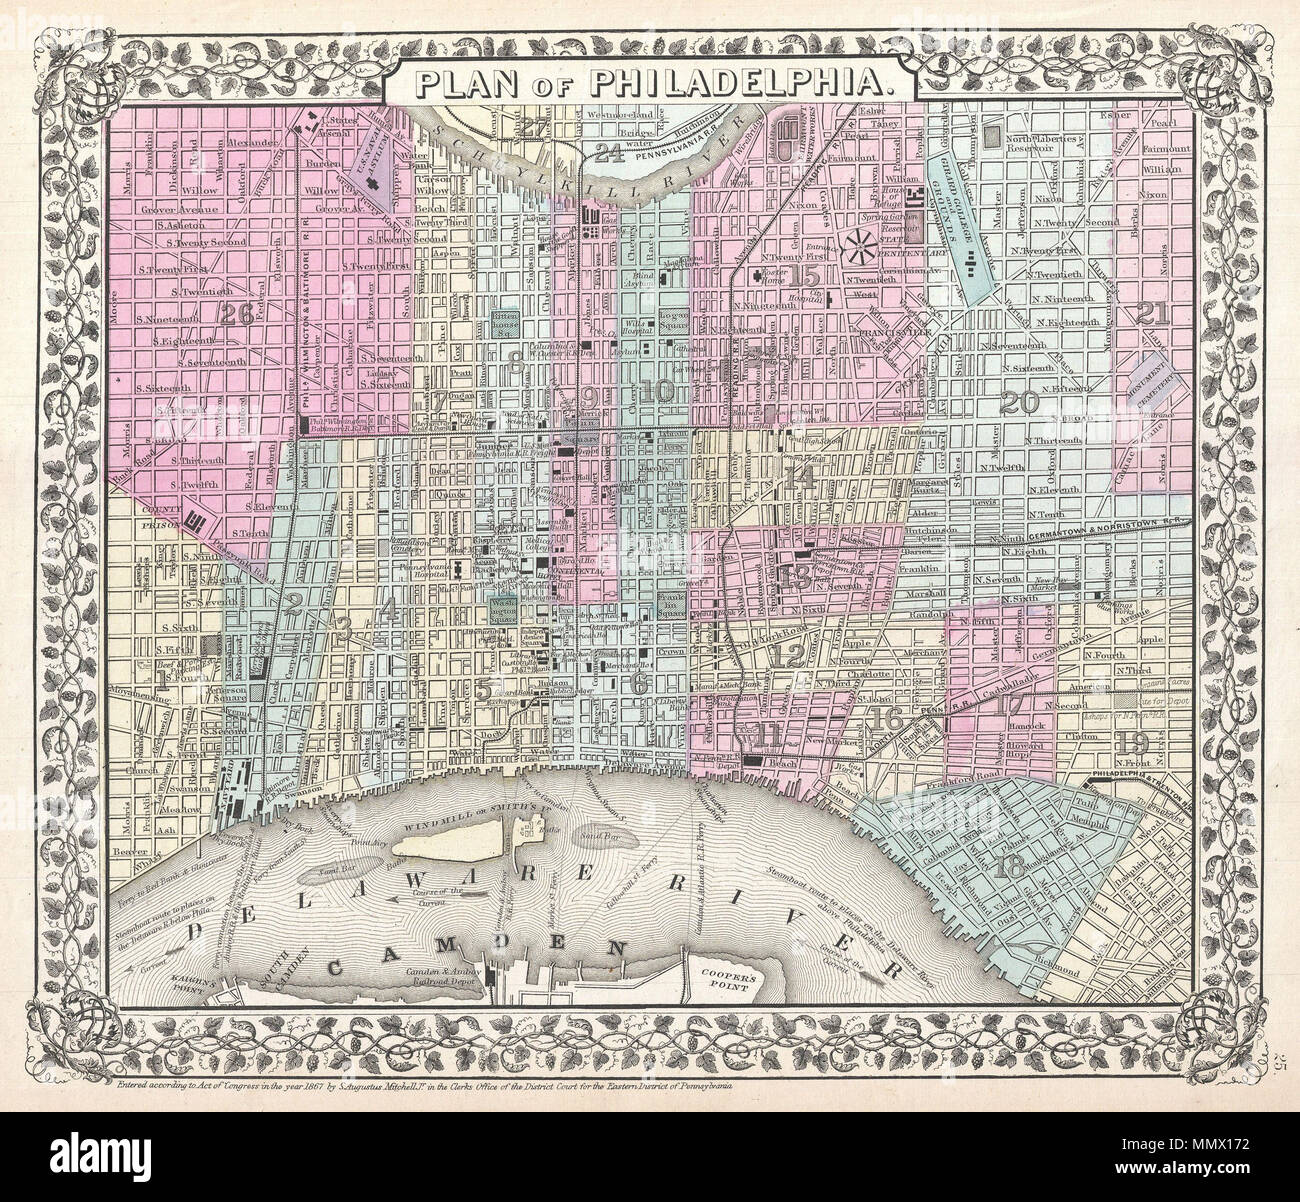 English: A beautiful example of S. A. Mitc Jr.'s 1867 ... on philadelphia subway map, philadelphia rail lines map, 1900 philadelphia map, philadelphia pa map, philadelphia us map, philadelphia street map, bellevue philadelphia map, restaurants philadelphia map, philadelphia hotel map, south philadelphia map, philadelphia county map, historic philadelphia map, philadelphia on the map, penn's landing philadelphia map, philadelphia attractions map, suburb philadelphia map, mexico city and surrounding area map, northeast philadelphia map, city philadelphia map, west philadelphia map,